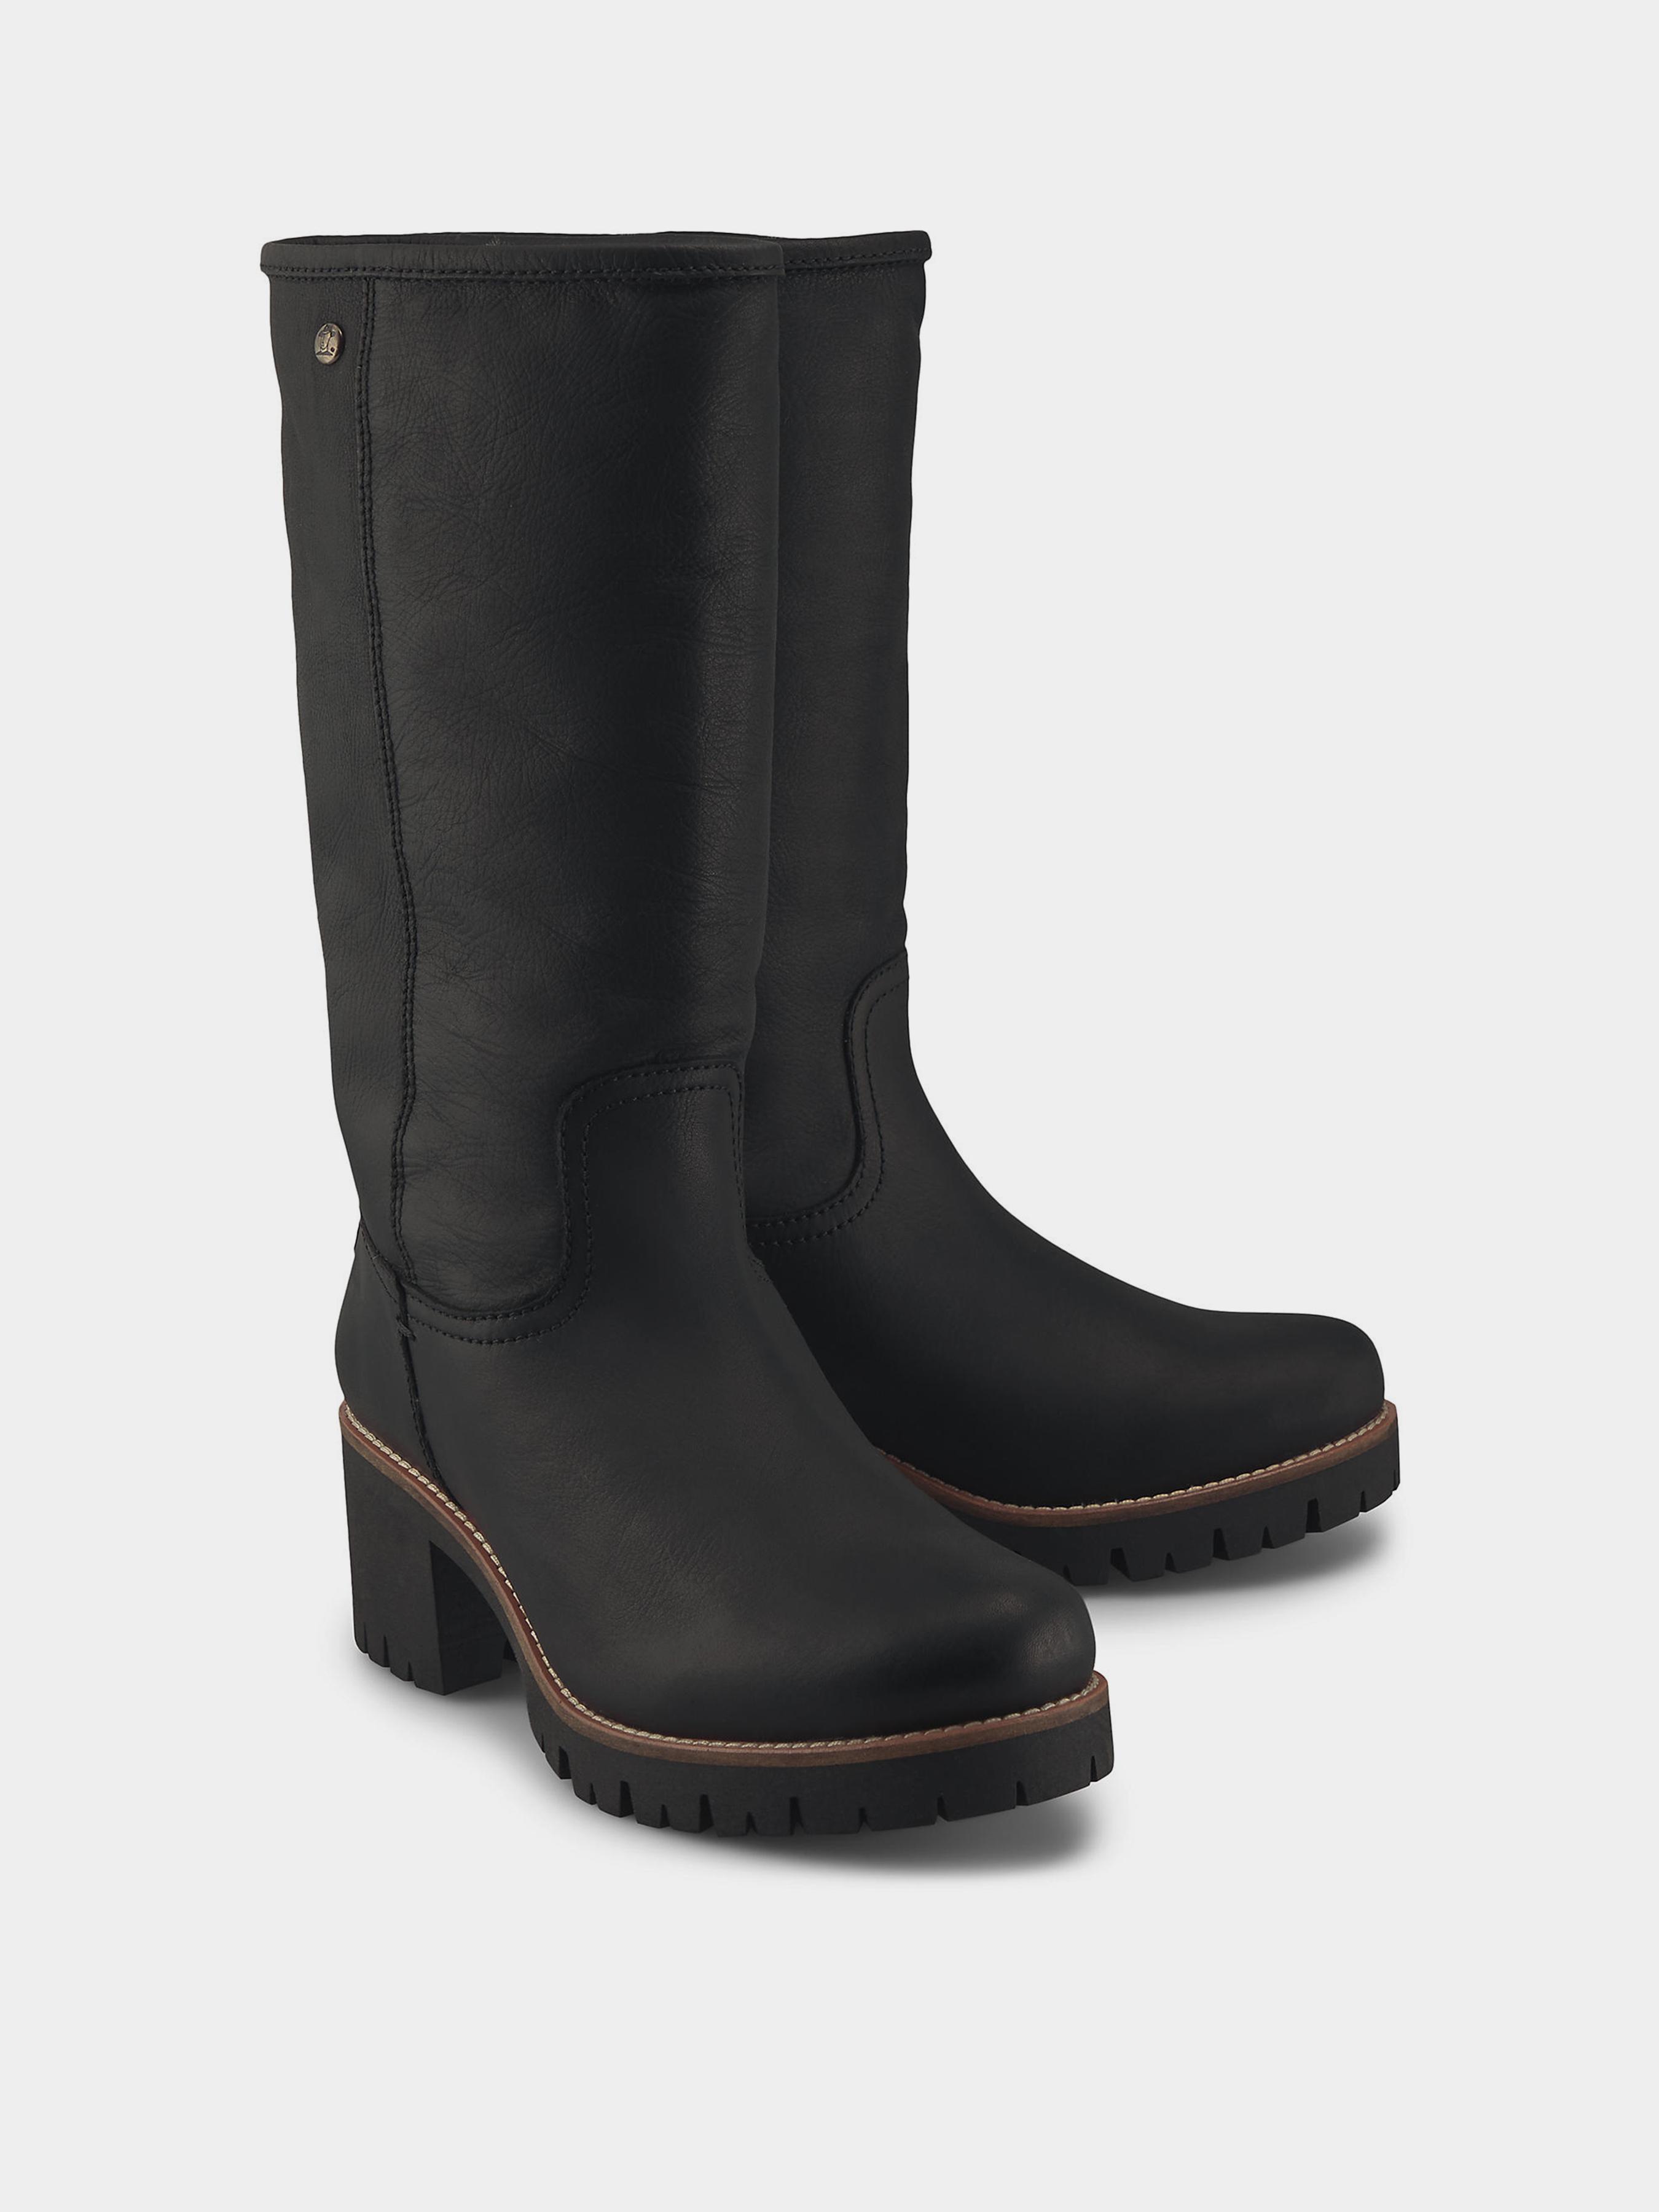 Сапоги для женщин Panama Jack PW195 размеры обуви, 2017